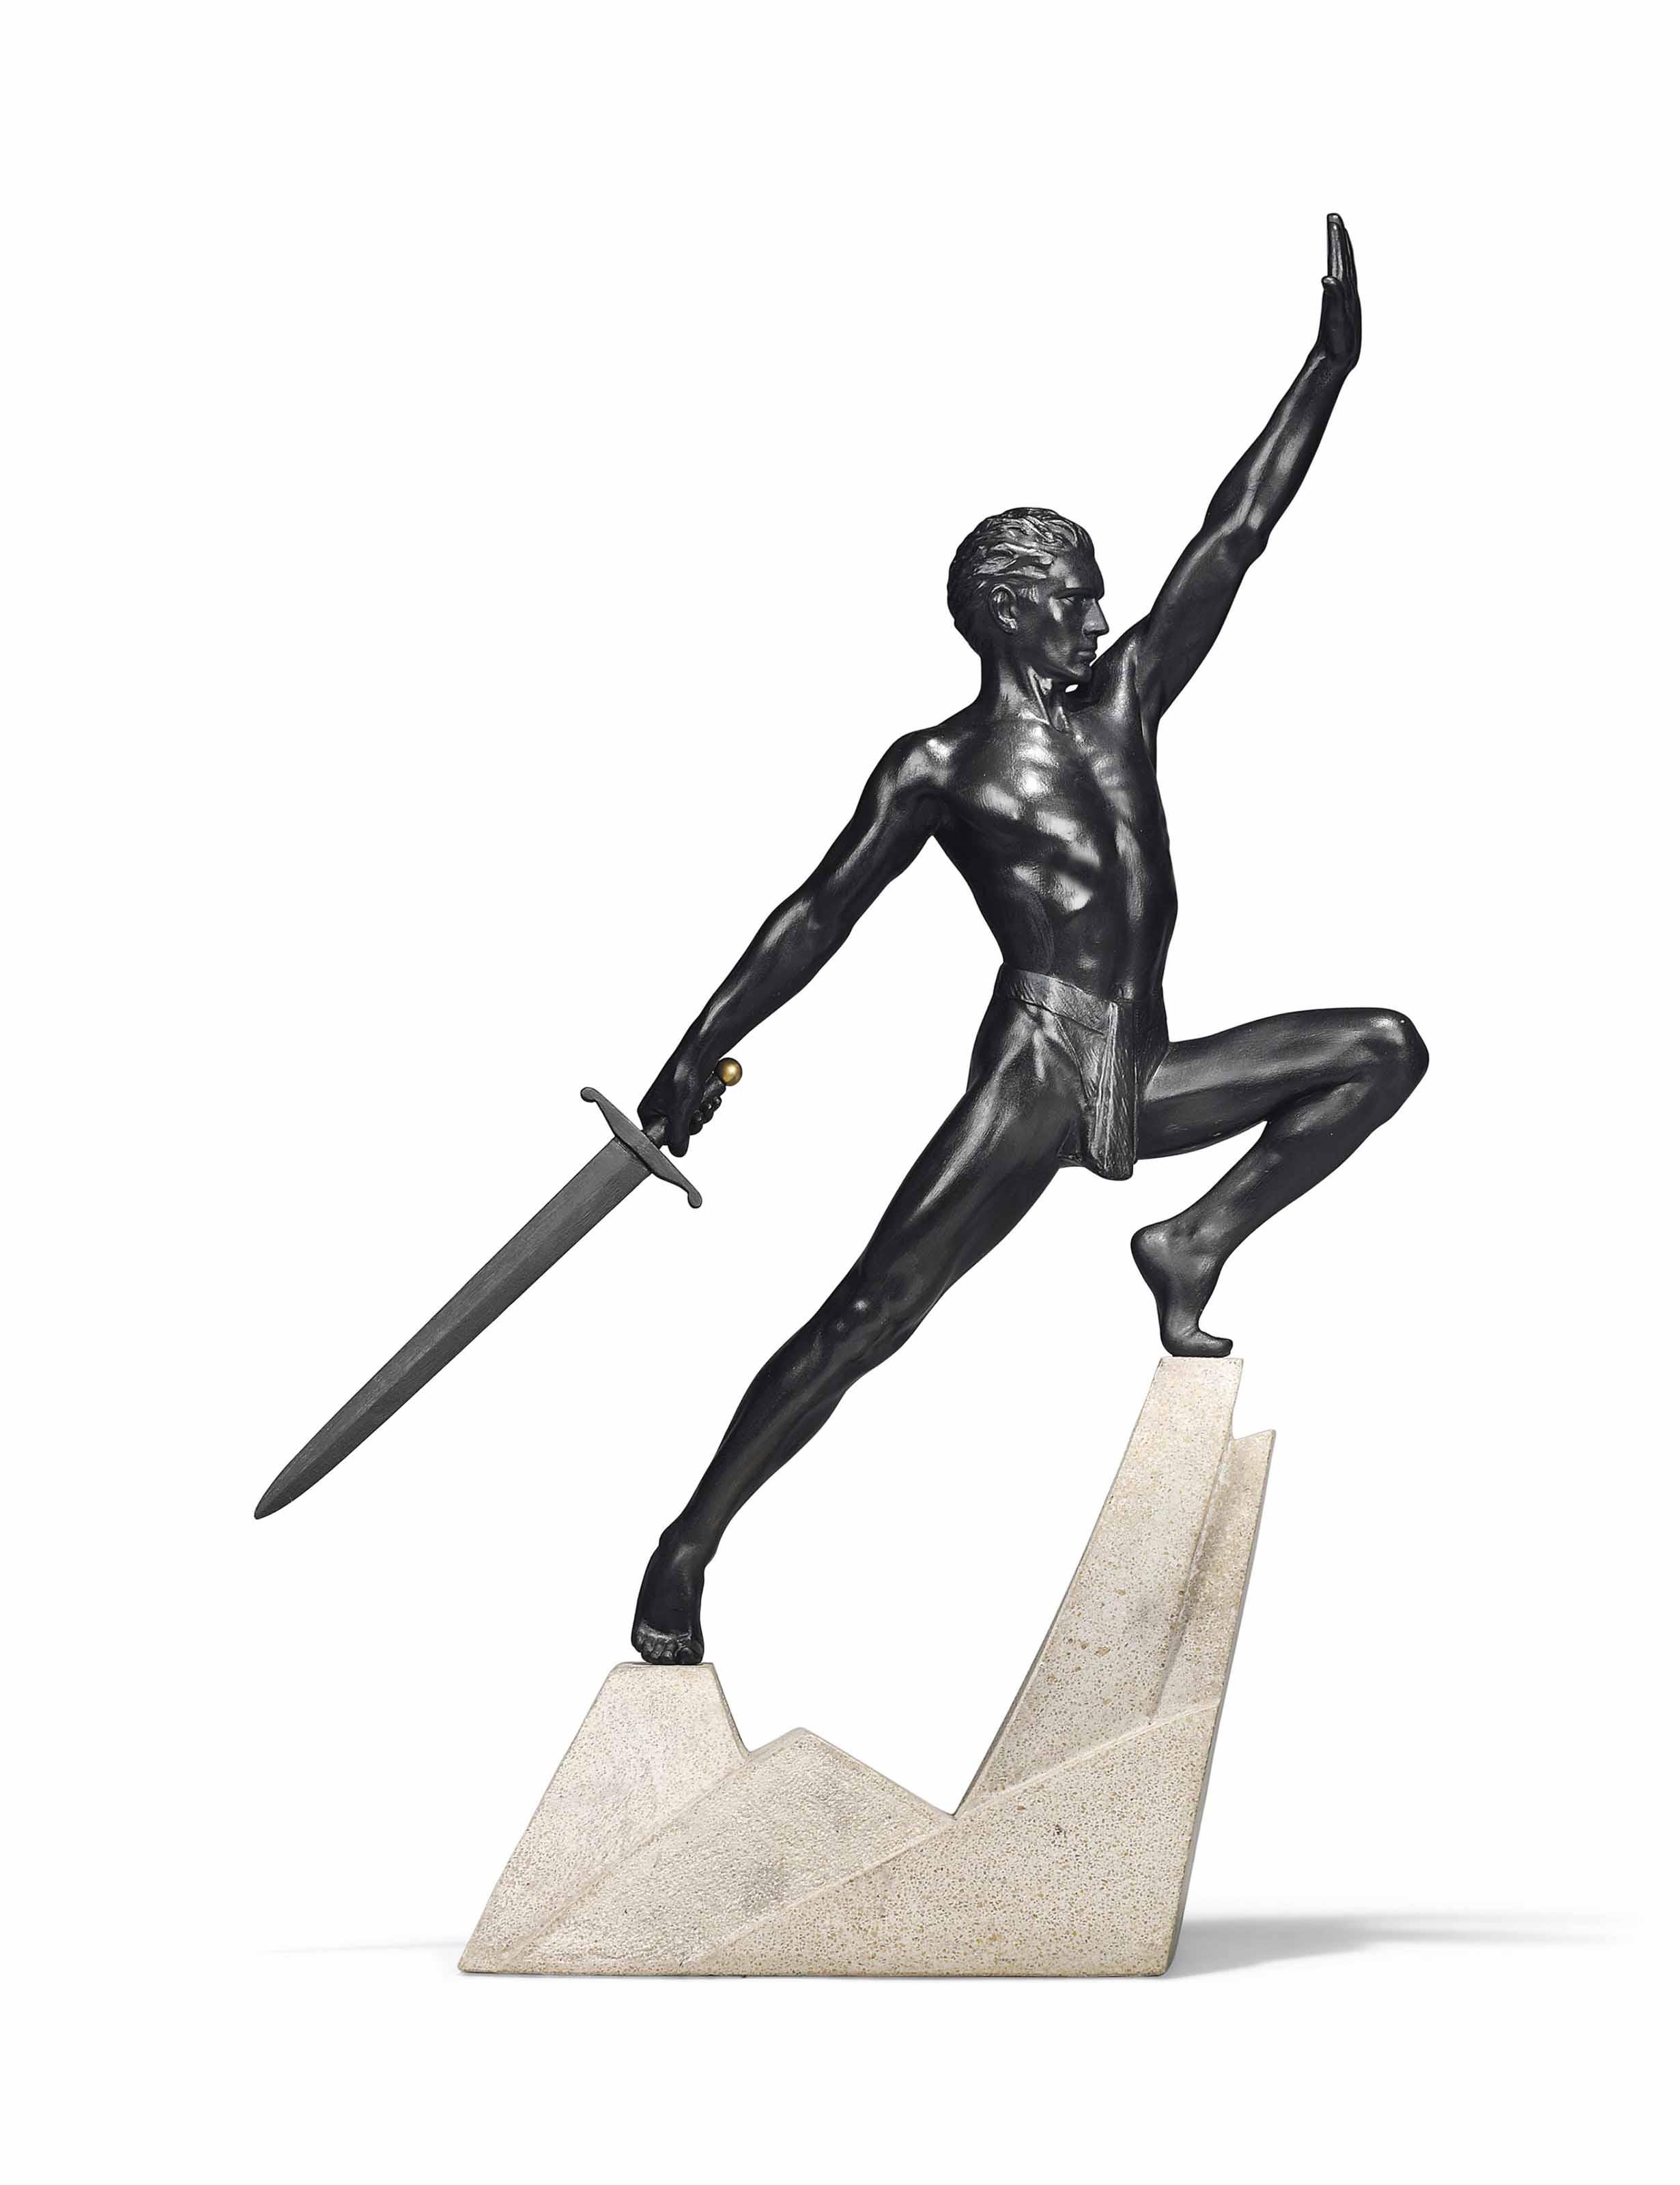 A MAX LE VERRIER (1891-1973) ART DECO COLD-PAINTED SPELTER FIGURE